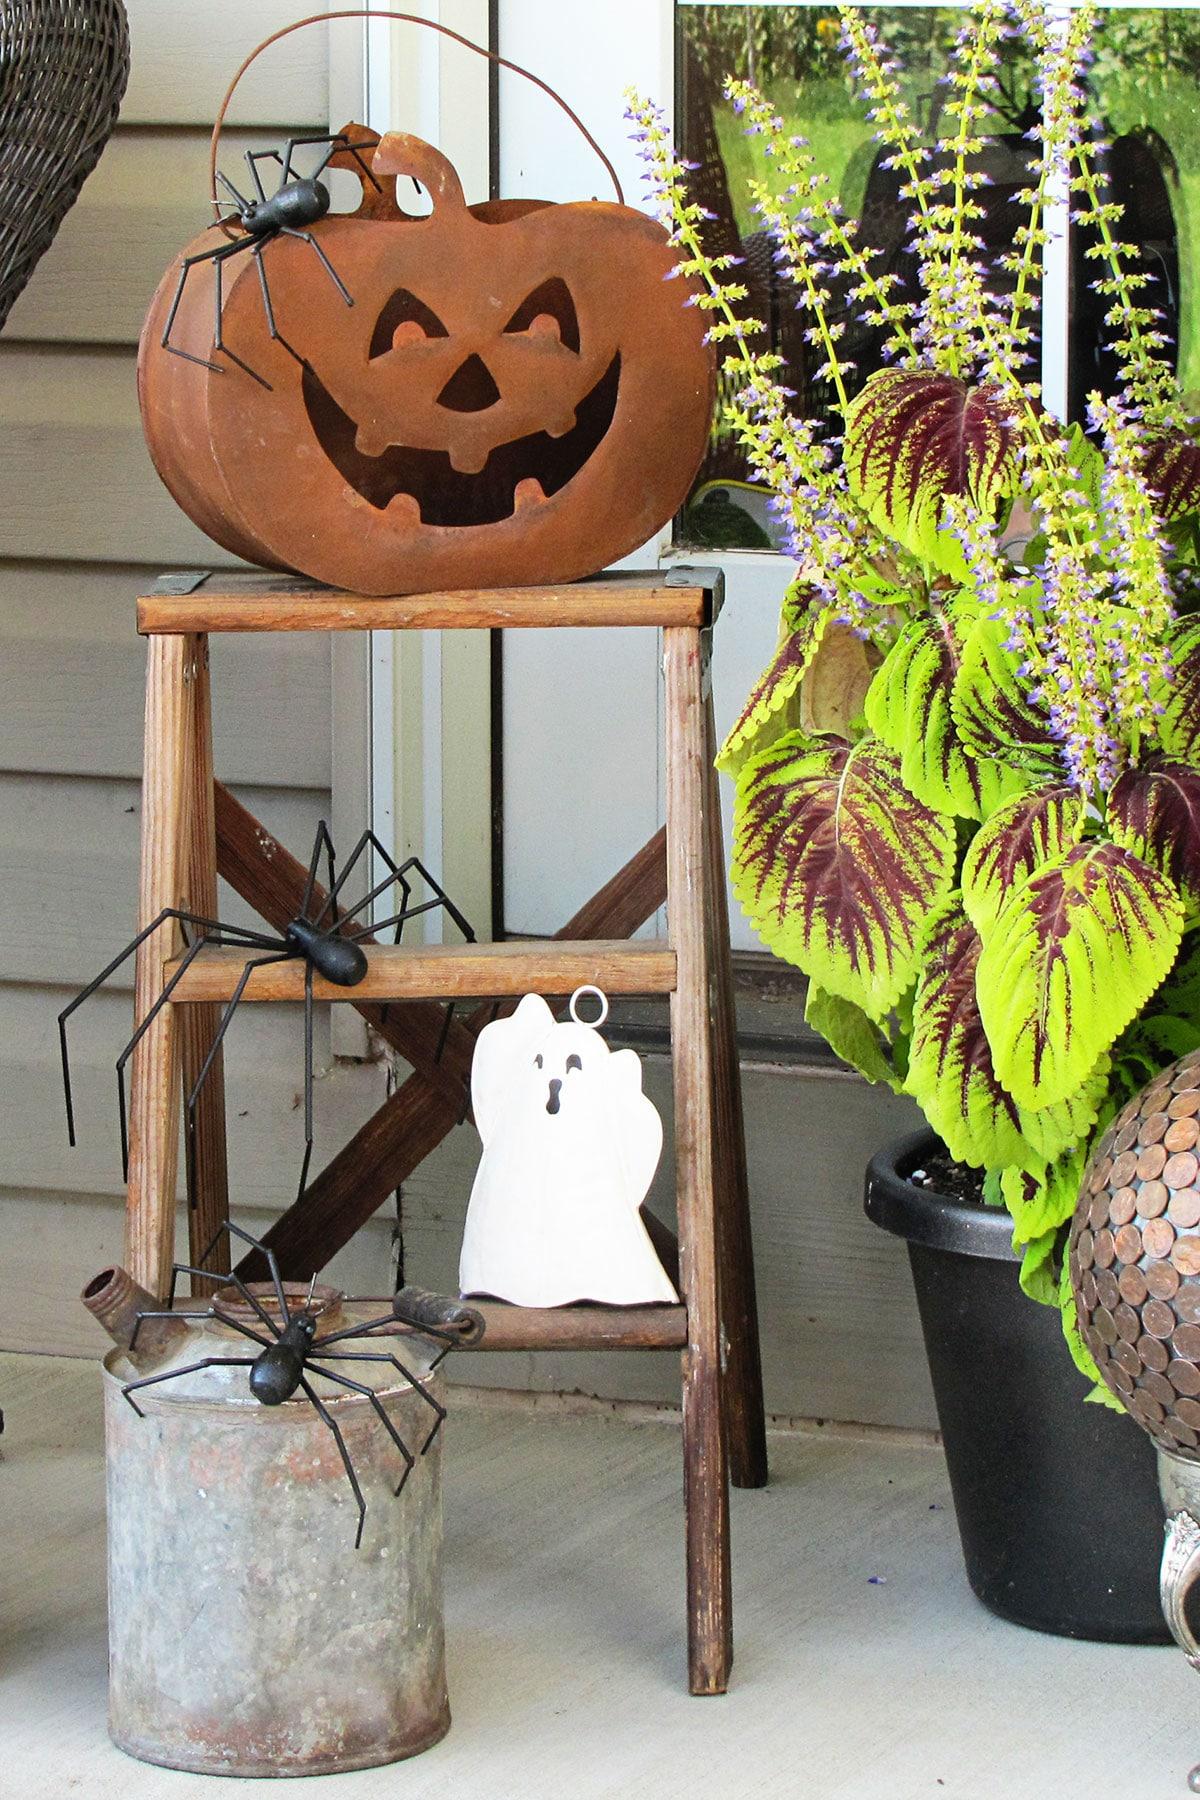 Halloween step ladder decor.